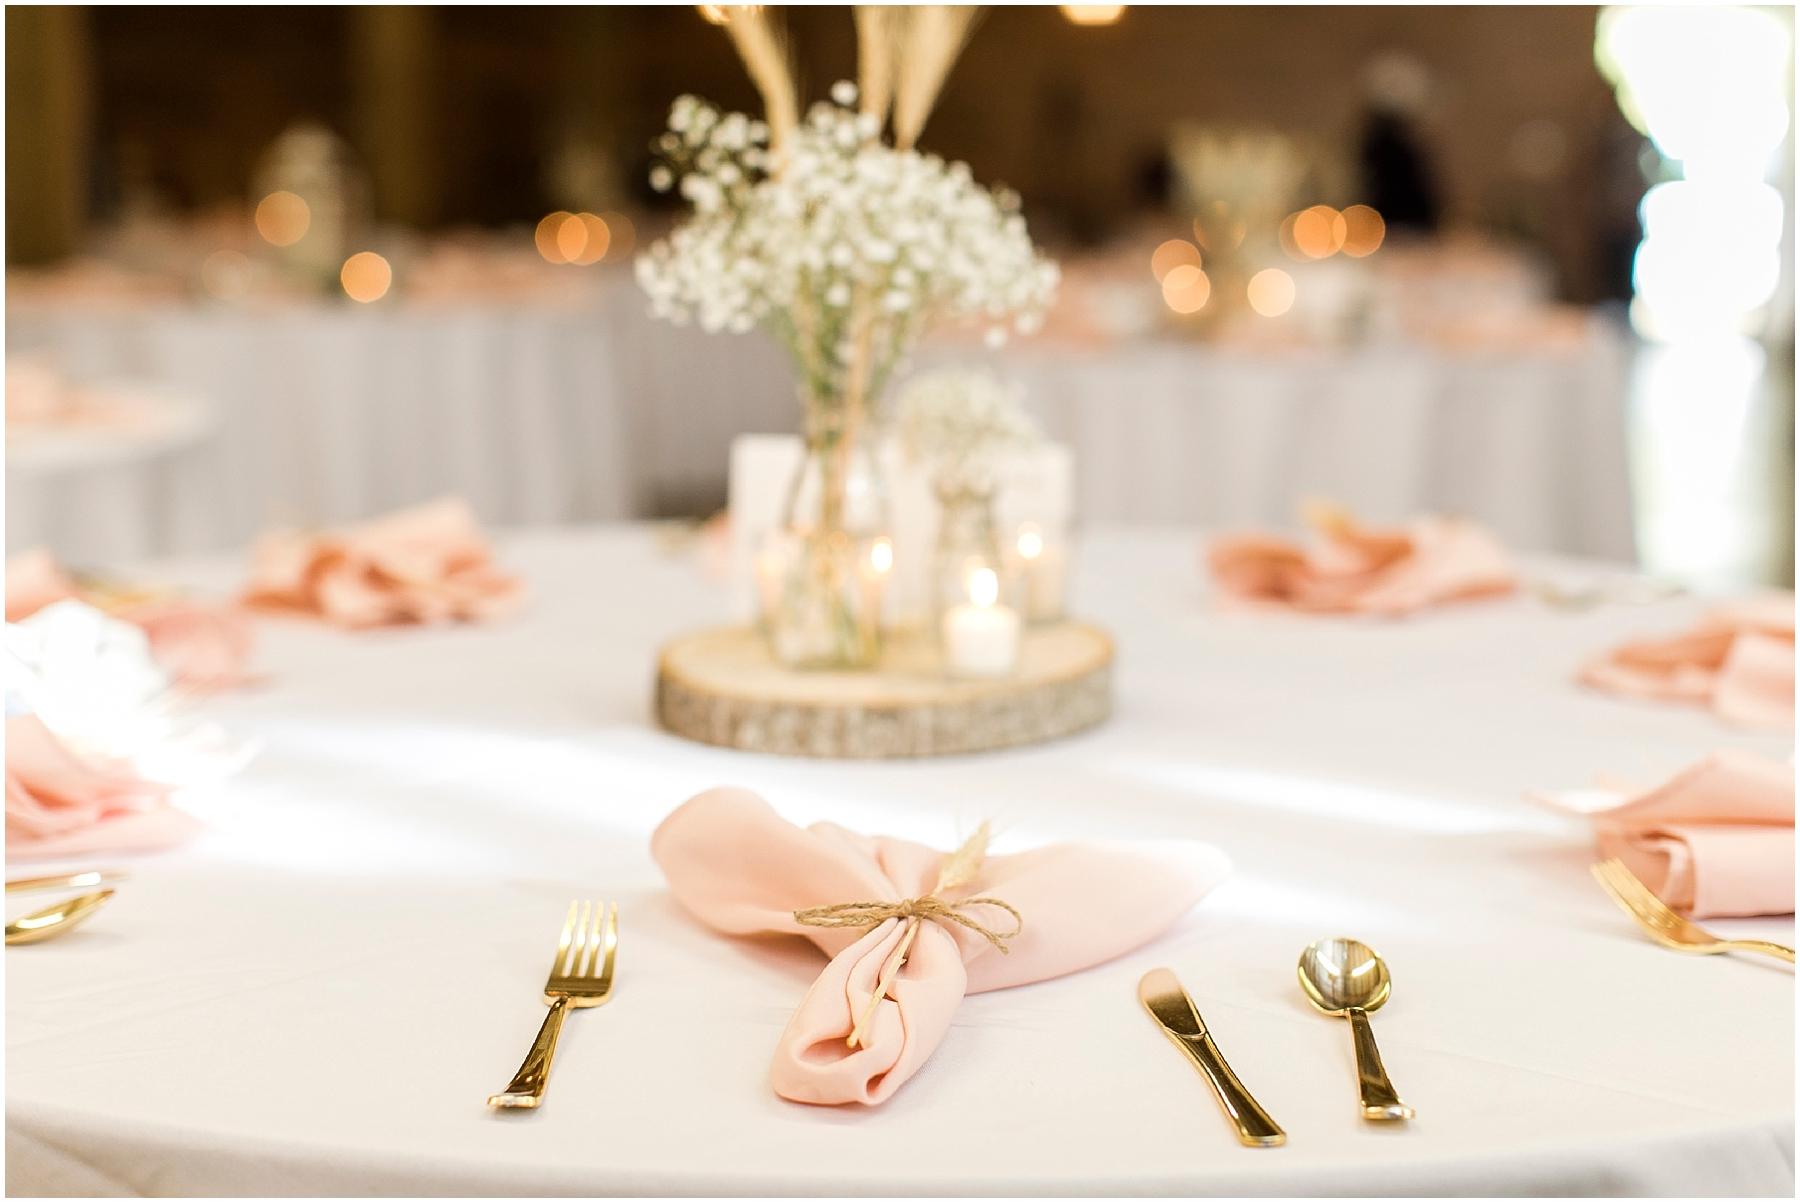 Harley's Haven Wedding reception, Smithfiled, Virginia